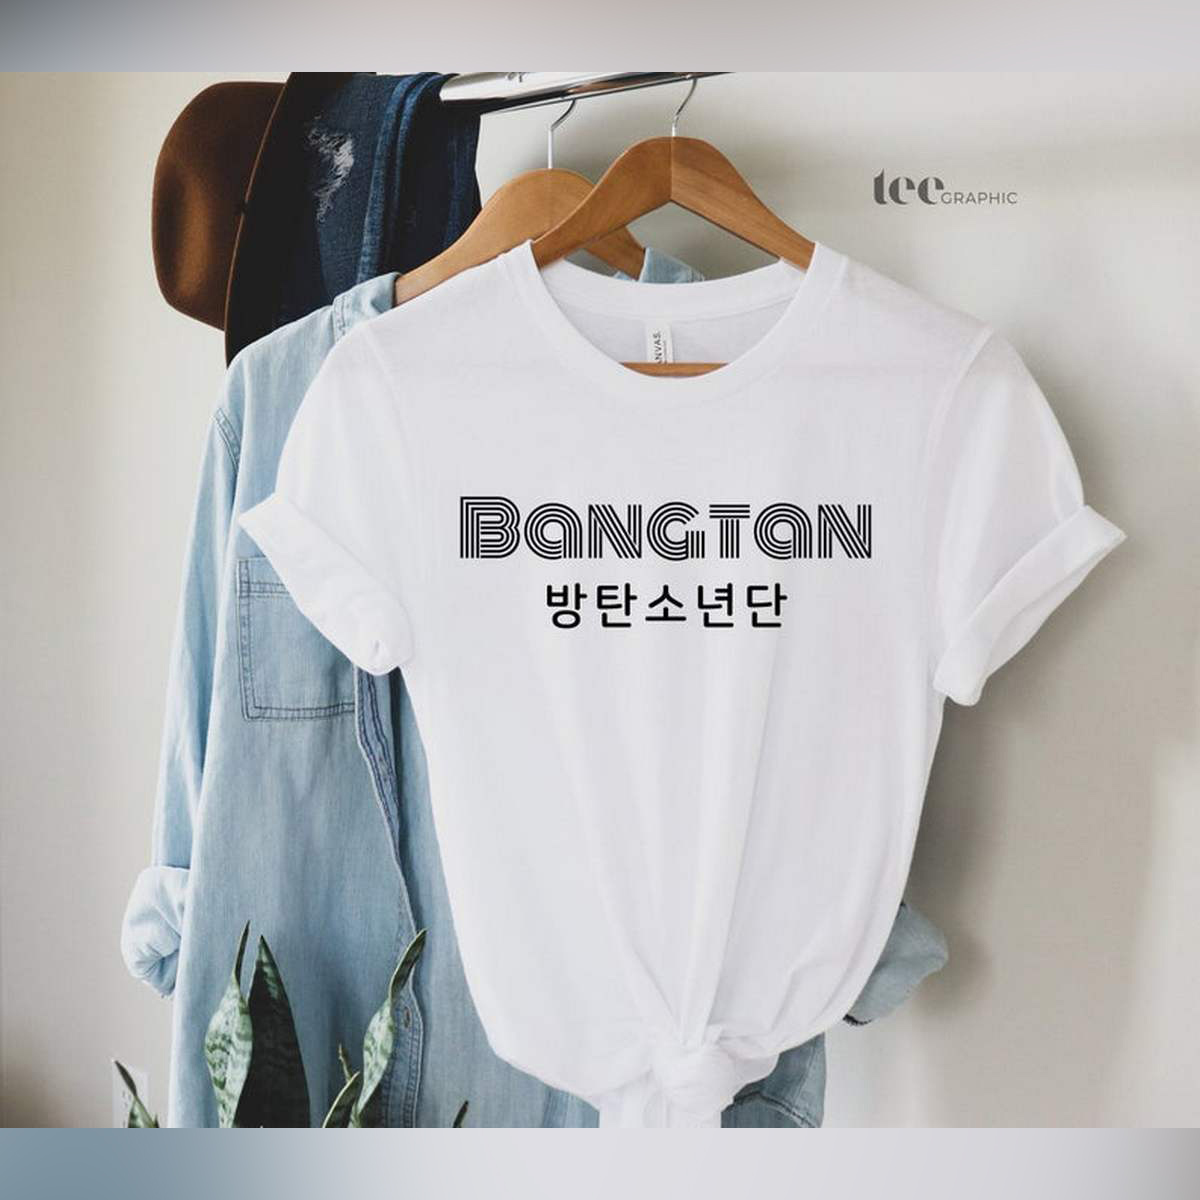 Bangtan Bts Army Cotton Printed T Shirt